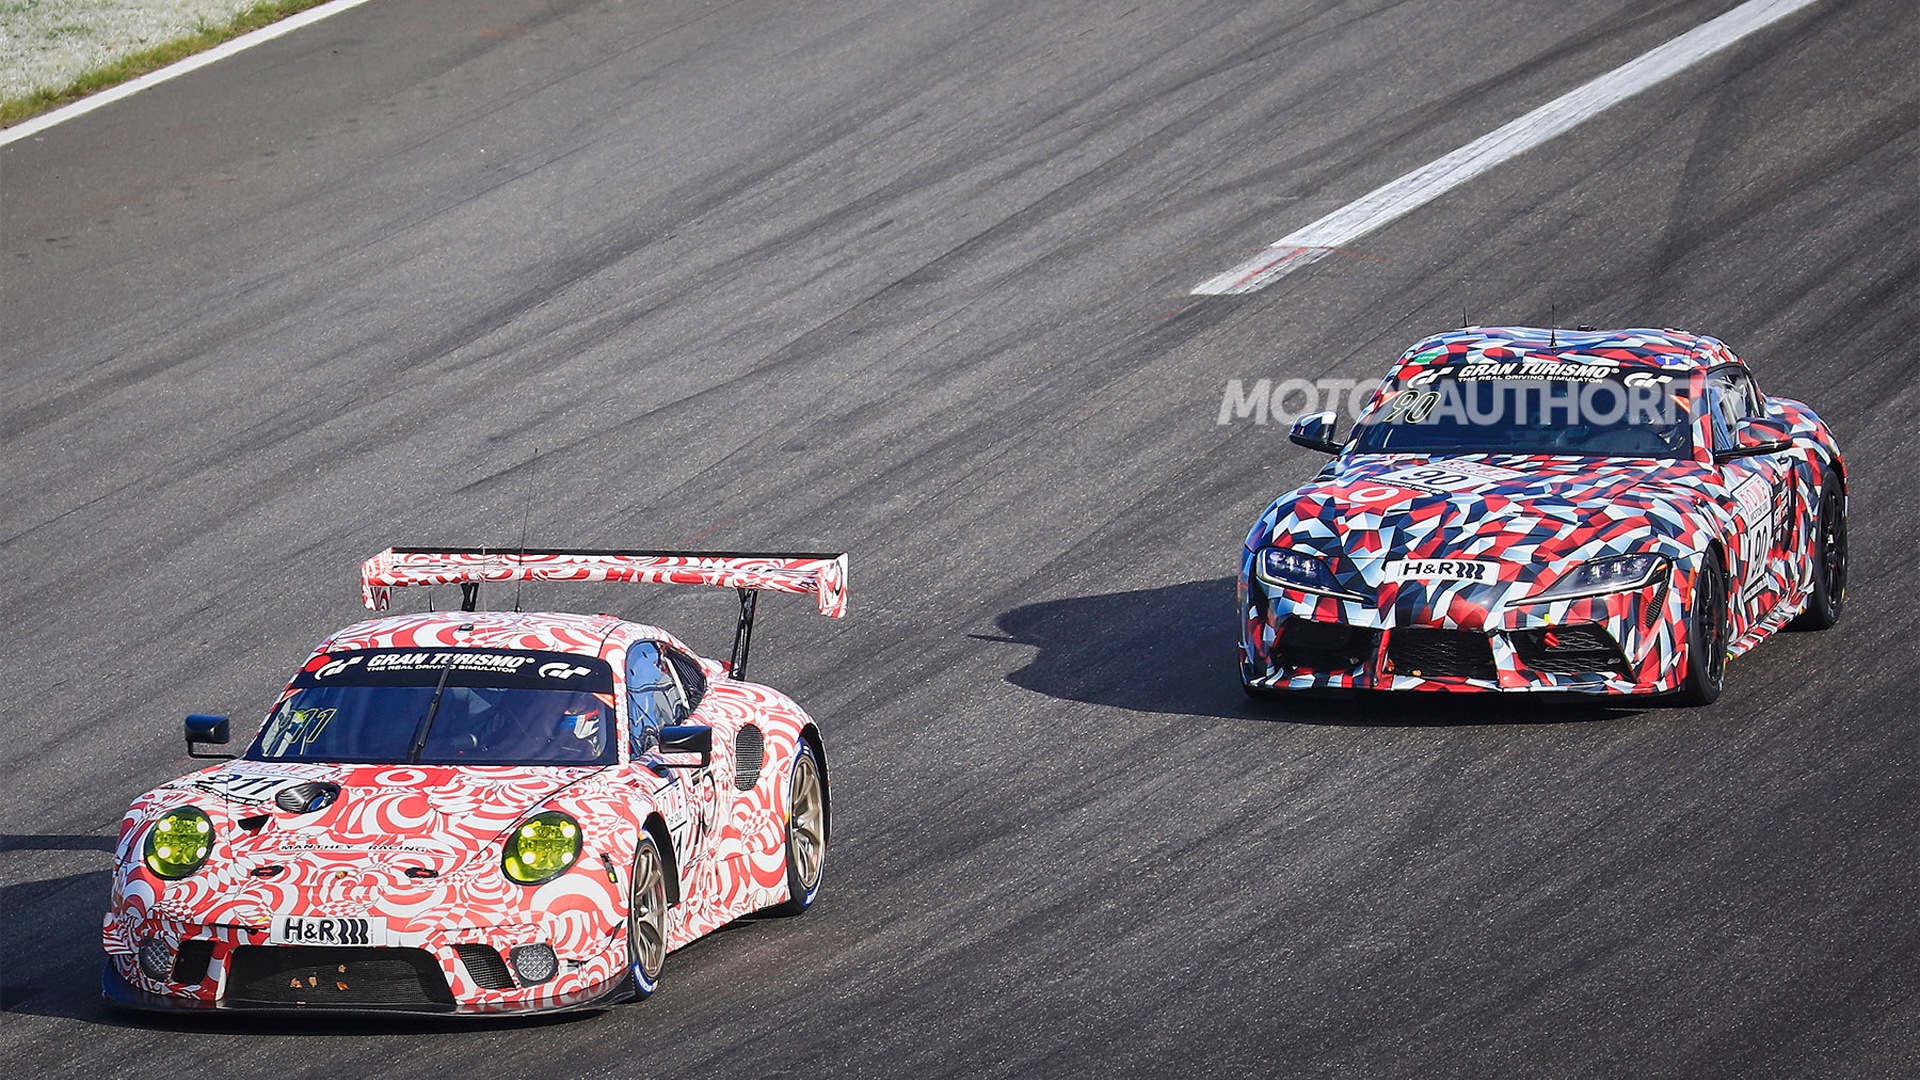 2020 Toyota Supra SP8T VLN race car - Image via S. Baldauf/SB-Medien